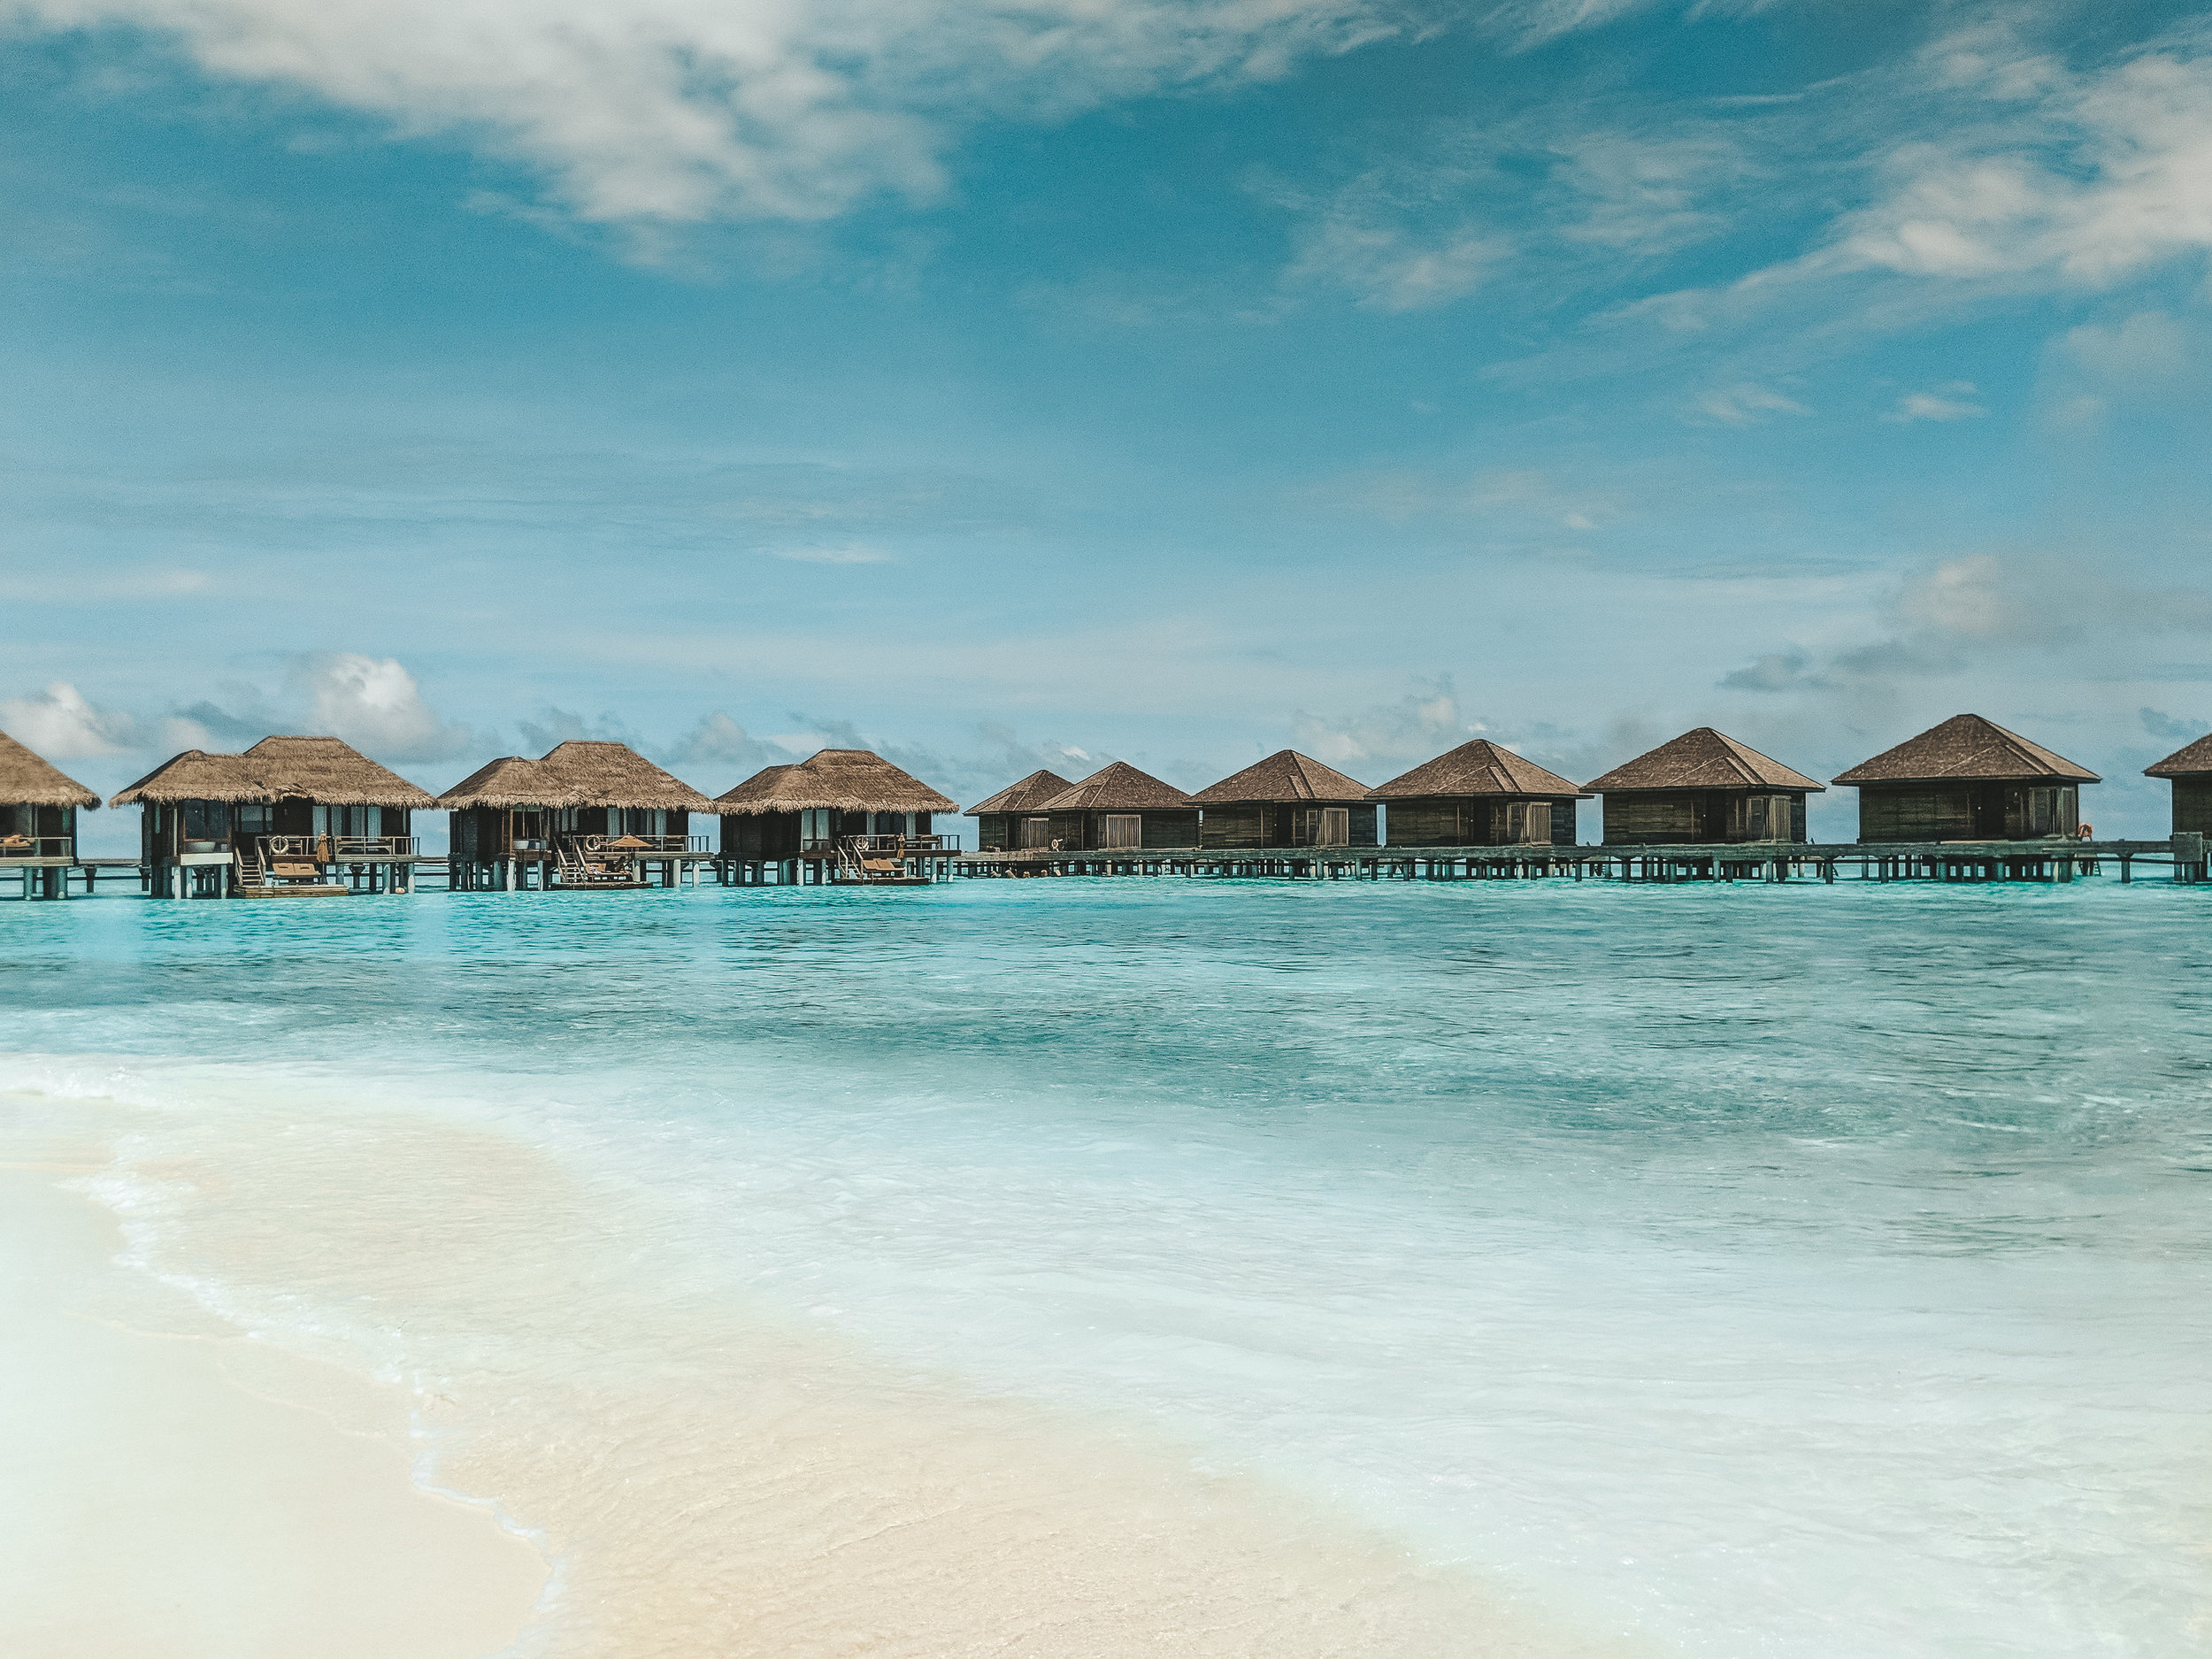 View of the bungalows at Anantara Veli, Maldives. boldlygotravel.co